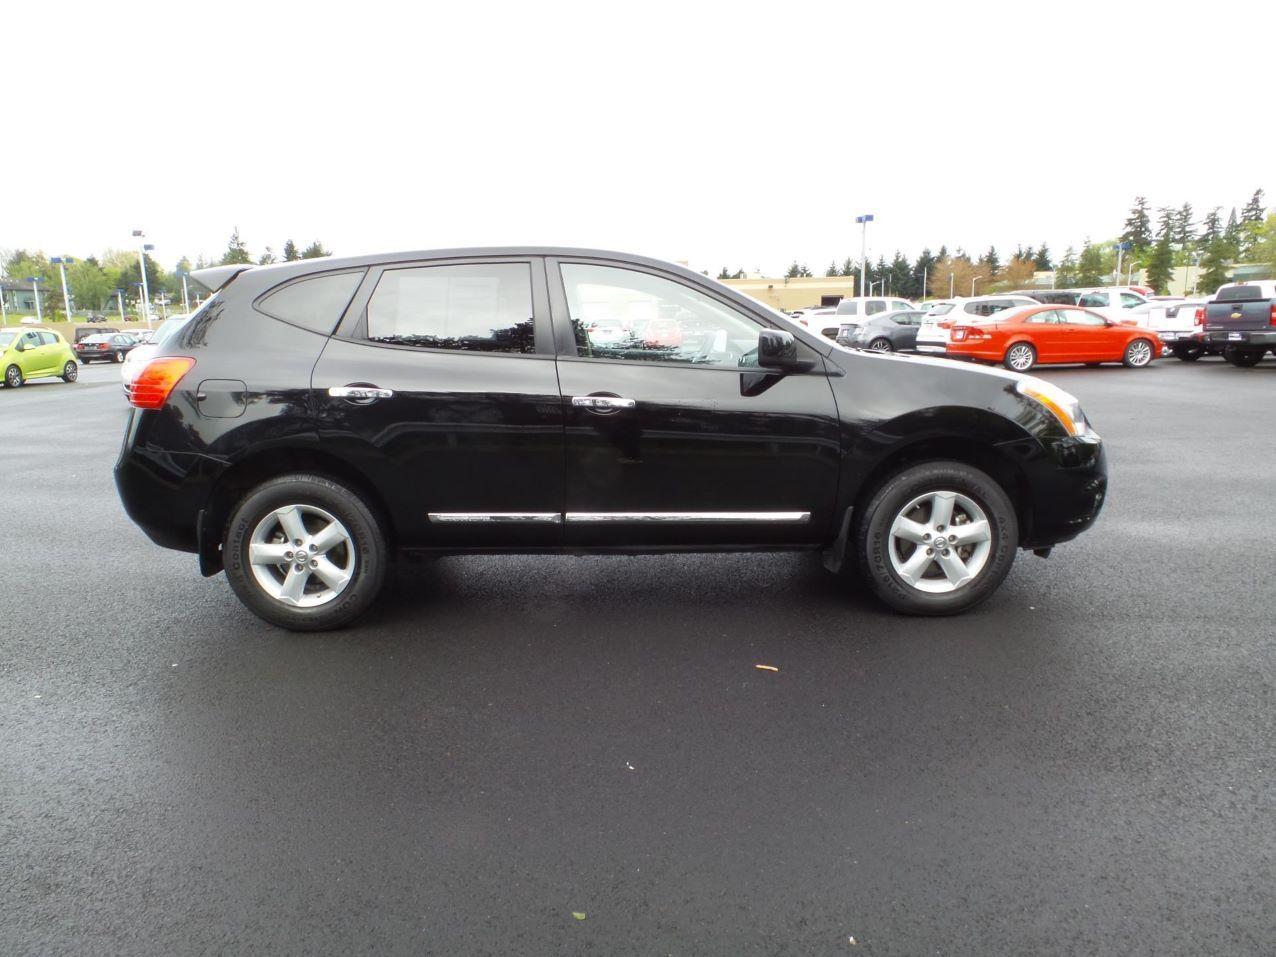 Used 2013 Nissan Rogue in Milwaukie, Oregon   CarMax   Nissan rogue,  Nissan, Carmax